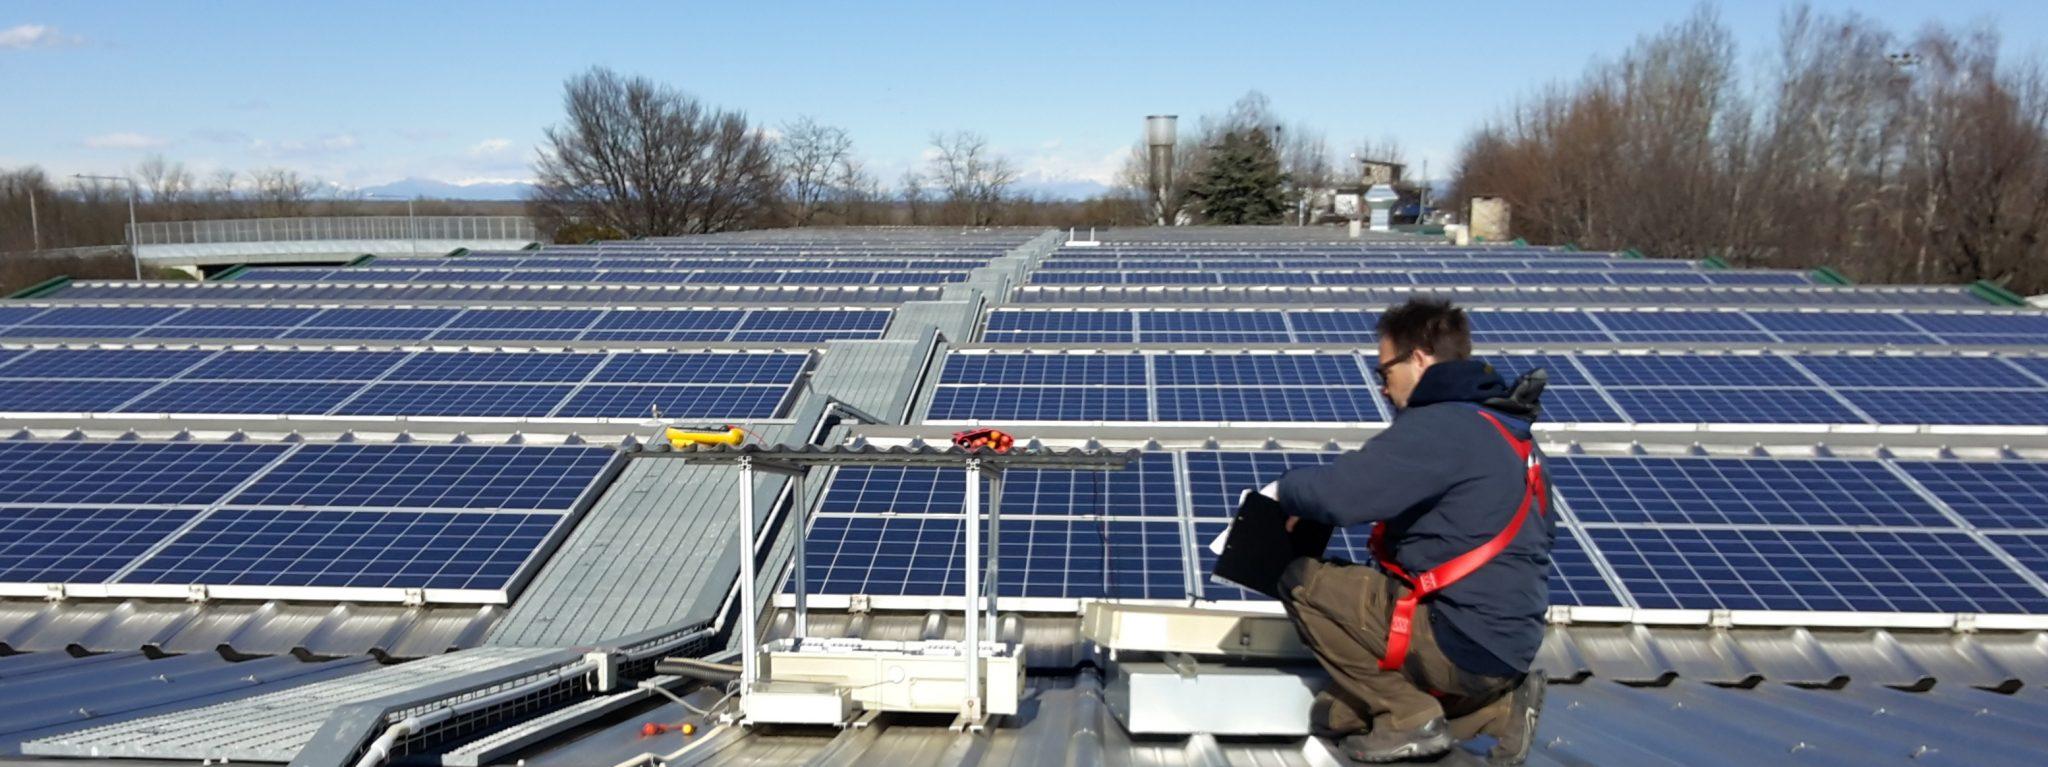 checkup fotovoltaico